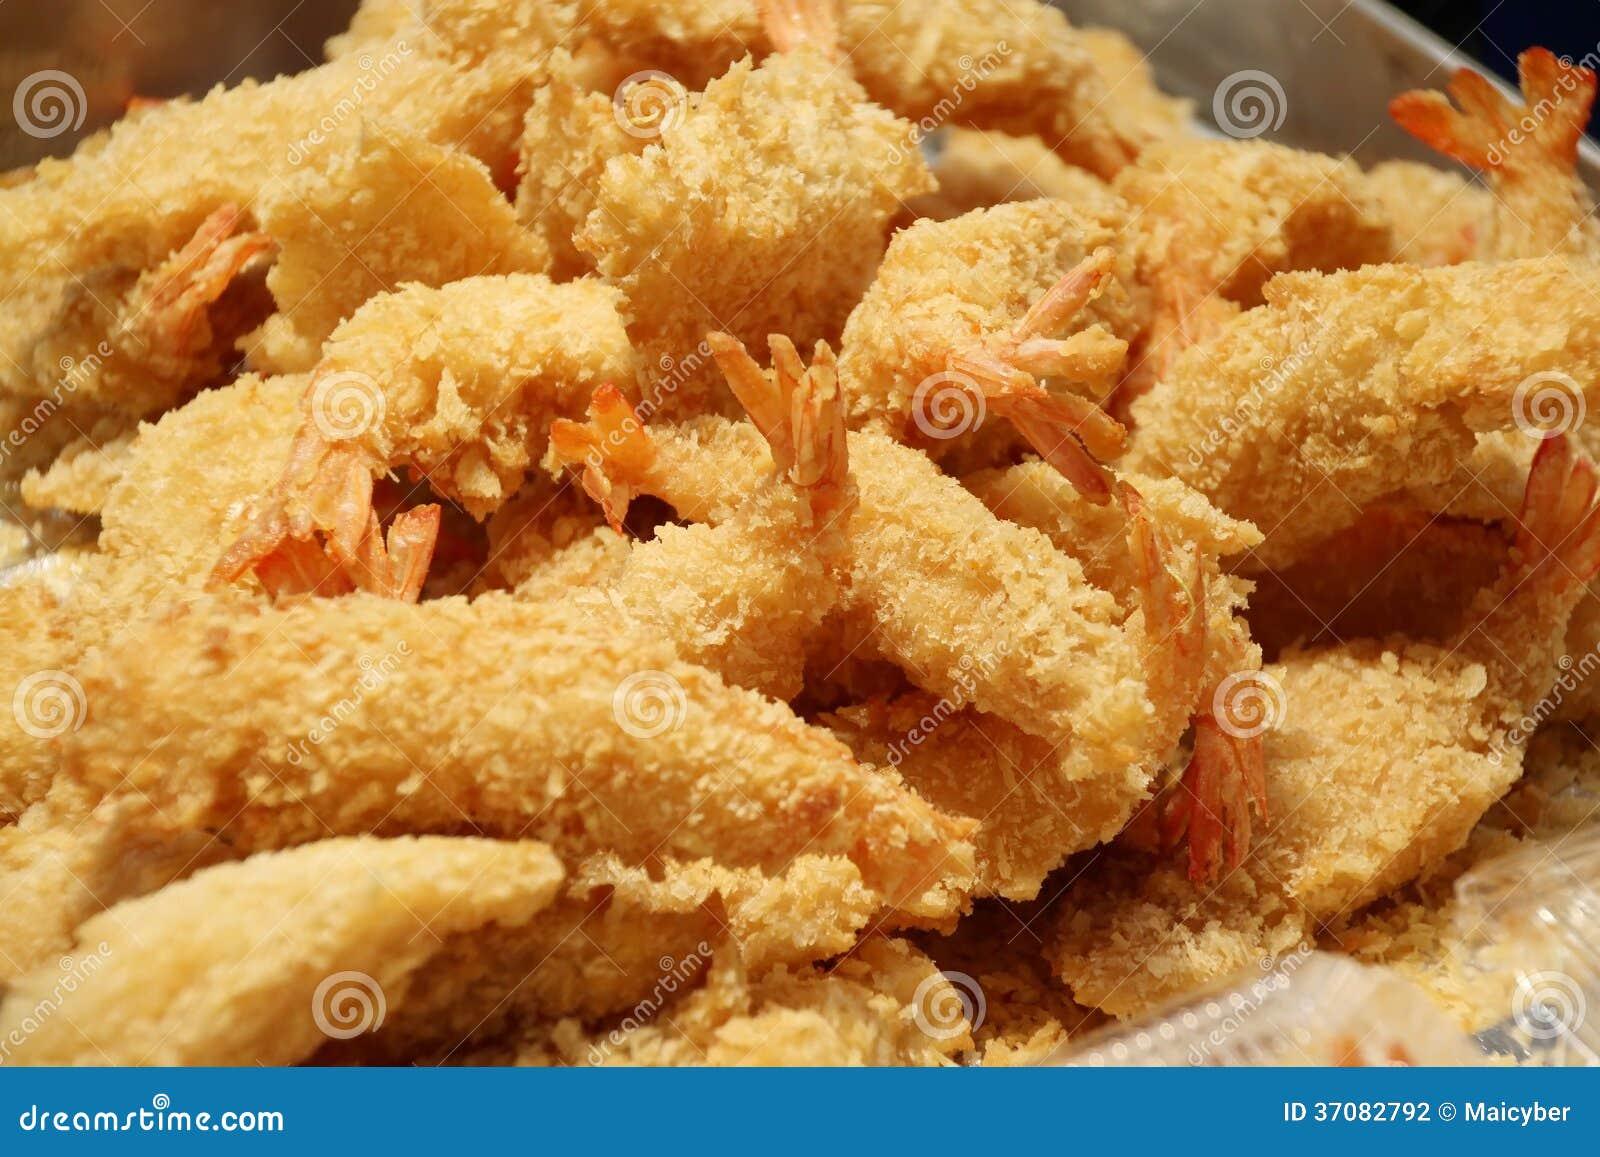 how to make batter fried prawns